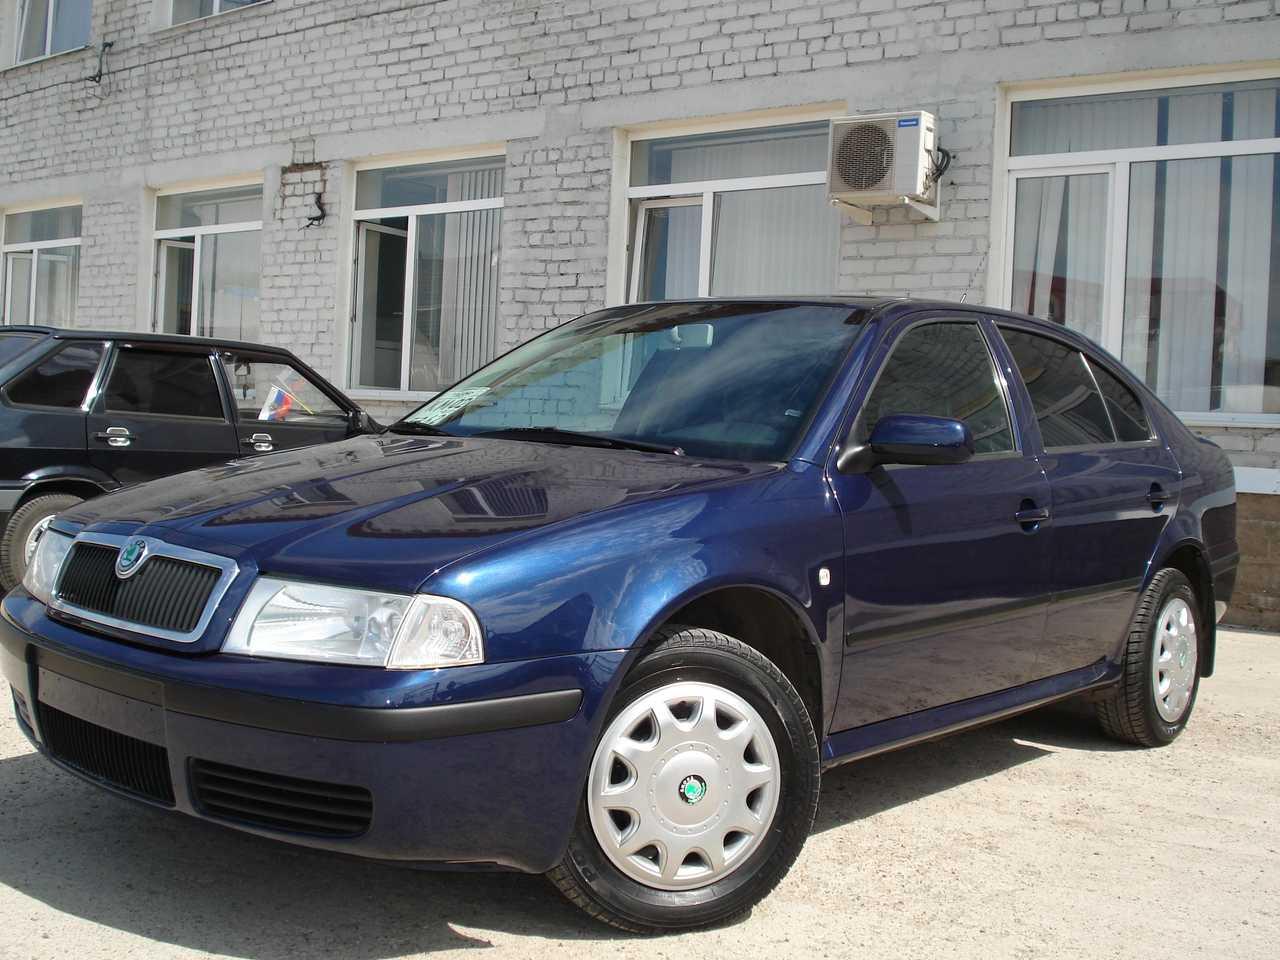 2006 Skoda Octavia For Sale  1400cc   Gasoline  Ff  Manual